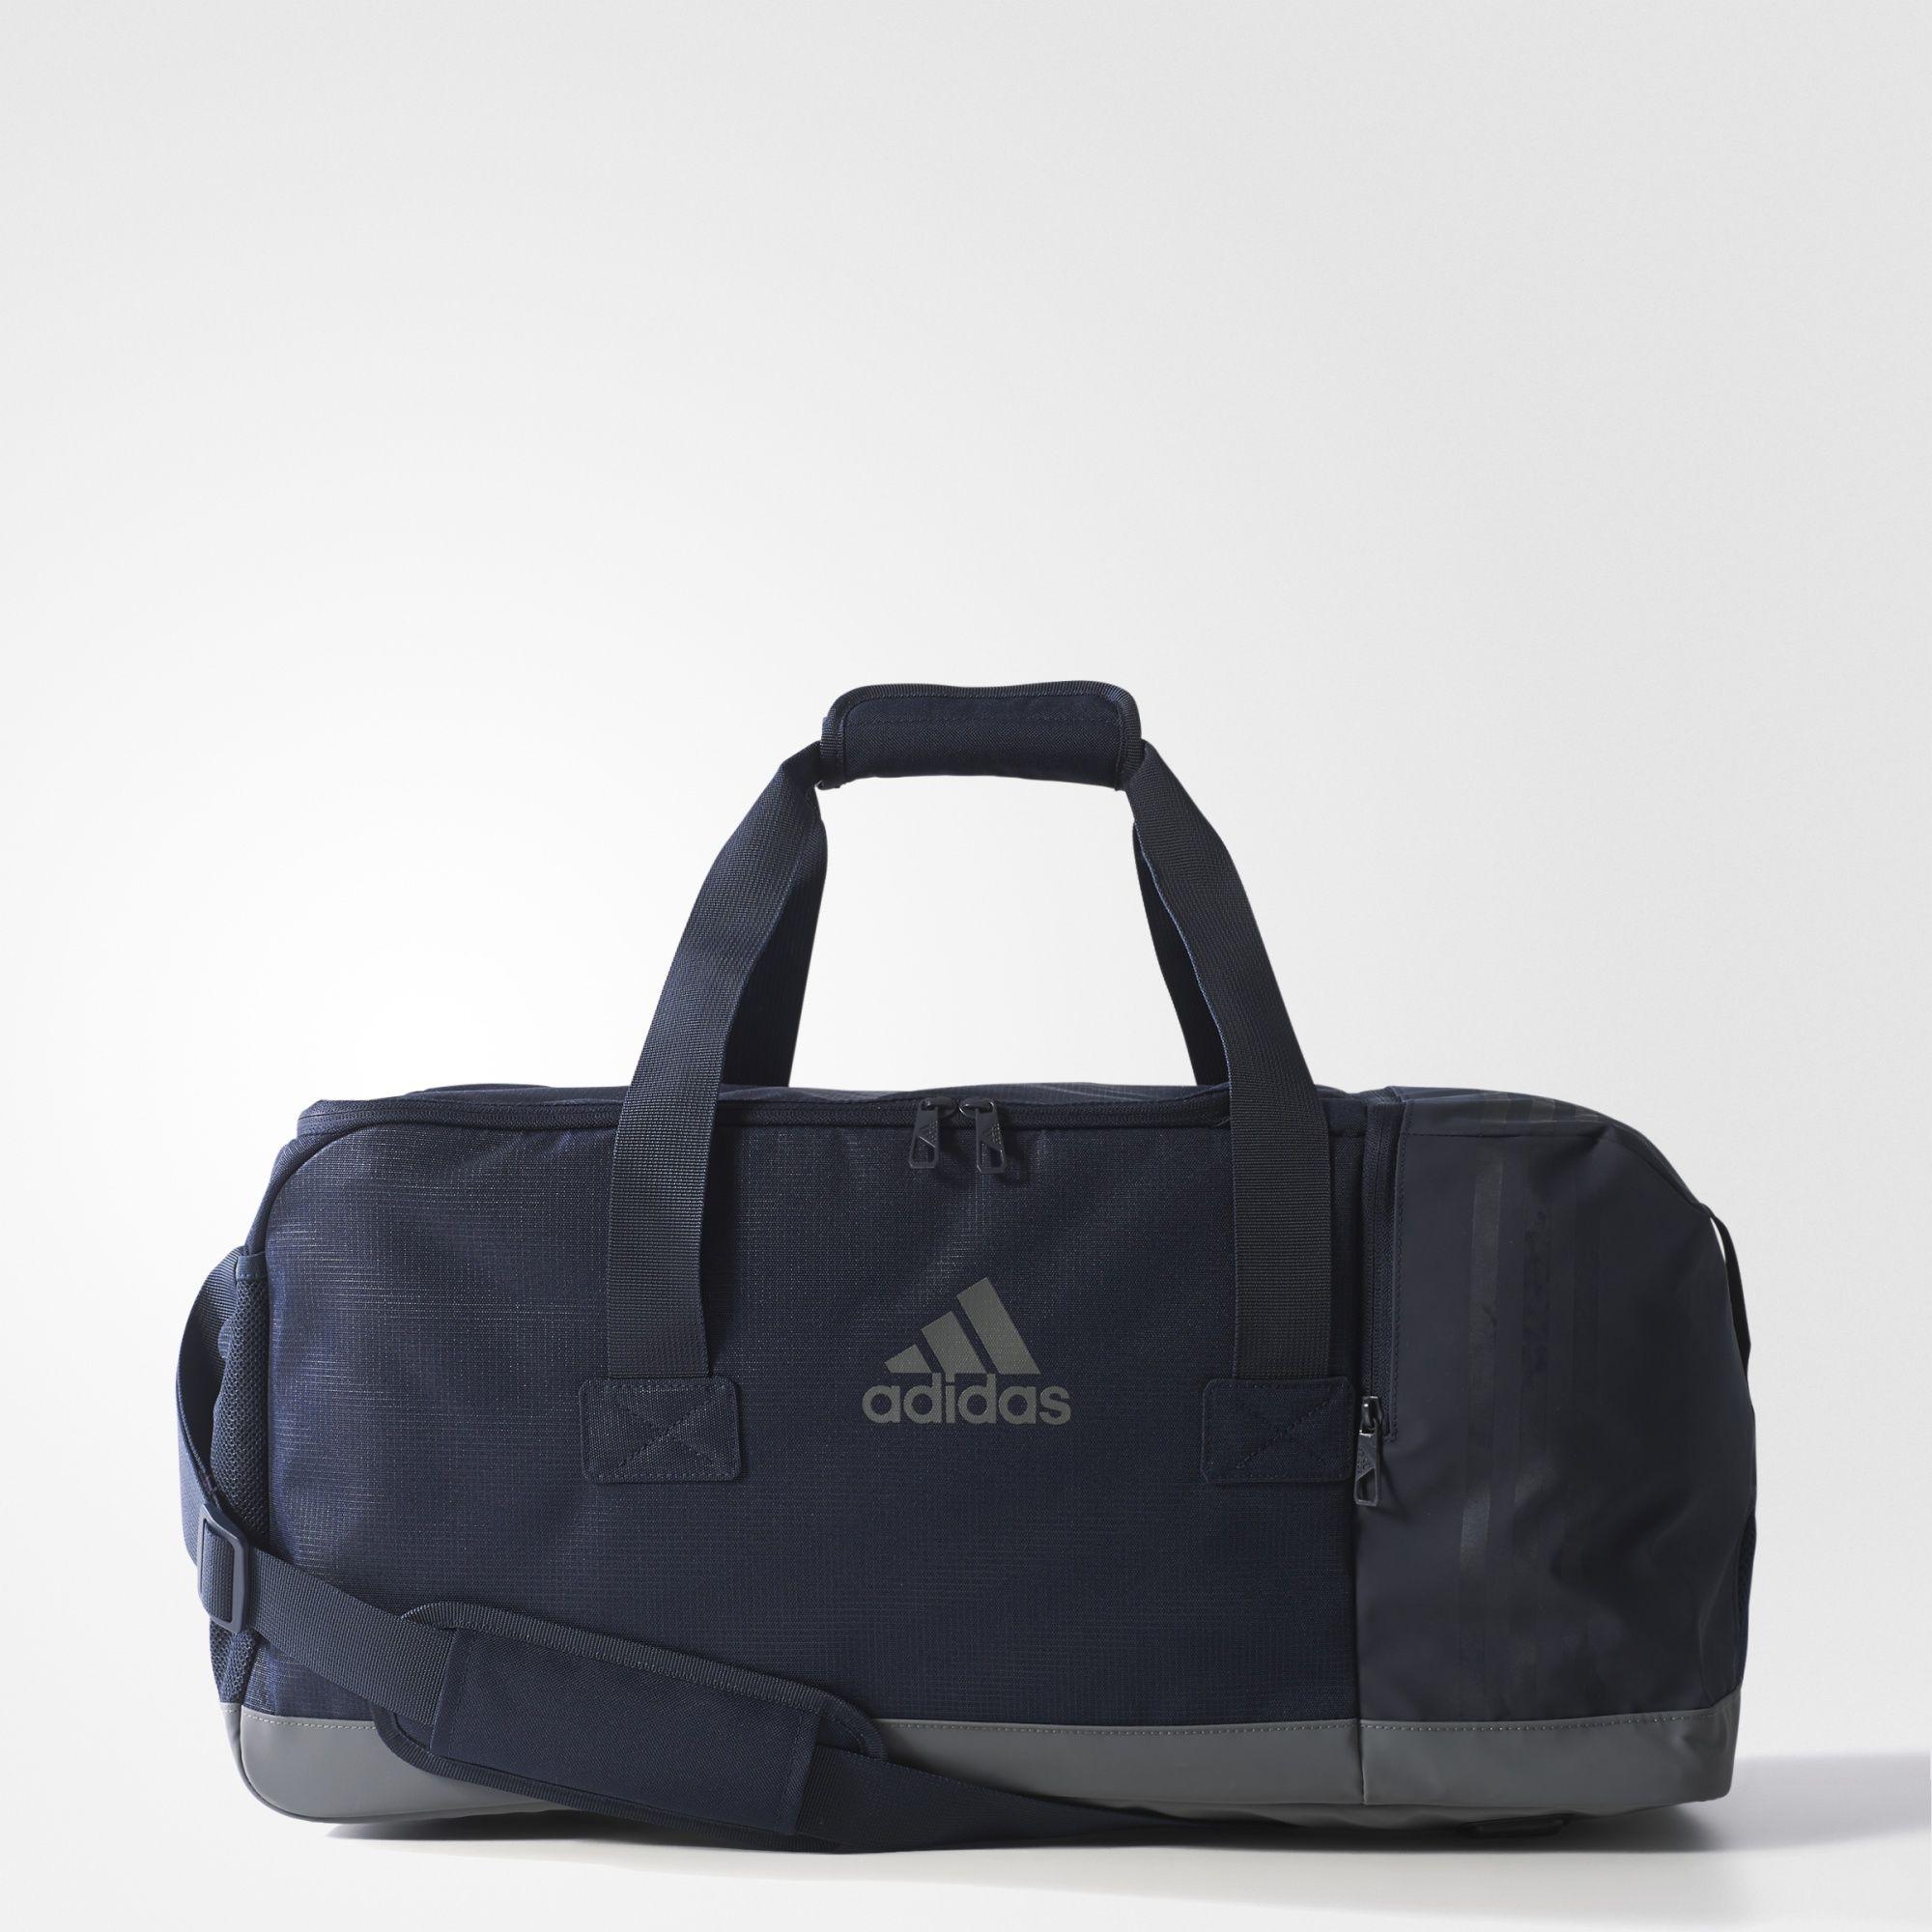 71c8ad9f5776 Спортивная сумка 3-Stripes BR5148 adidas Performance - Украина ...